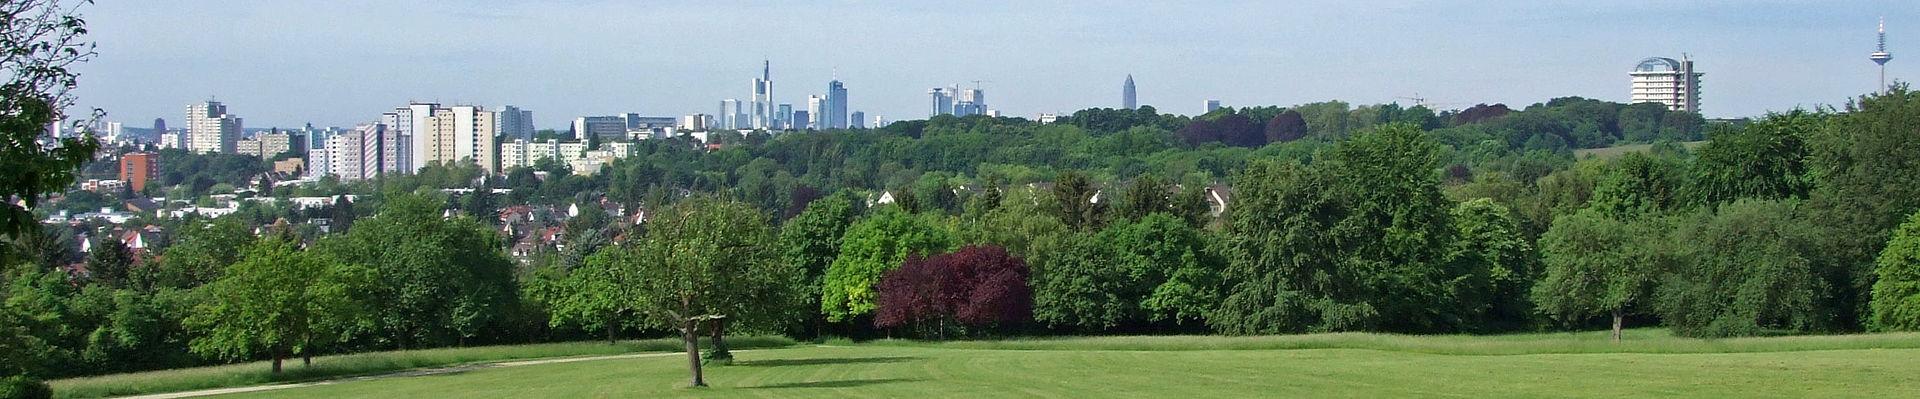 Panorama miasta z Lohrpark, źródło: http://home.meinestadt.de/frankfurt-am-main